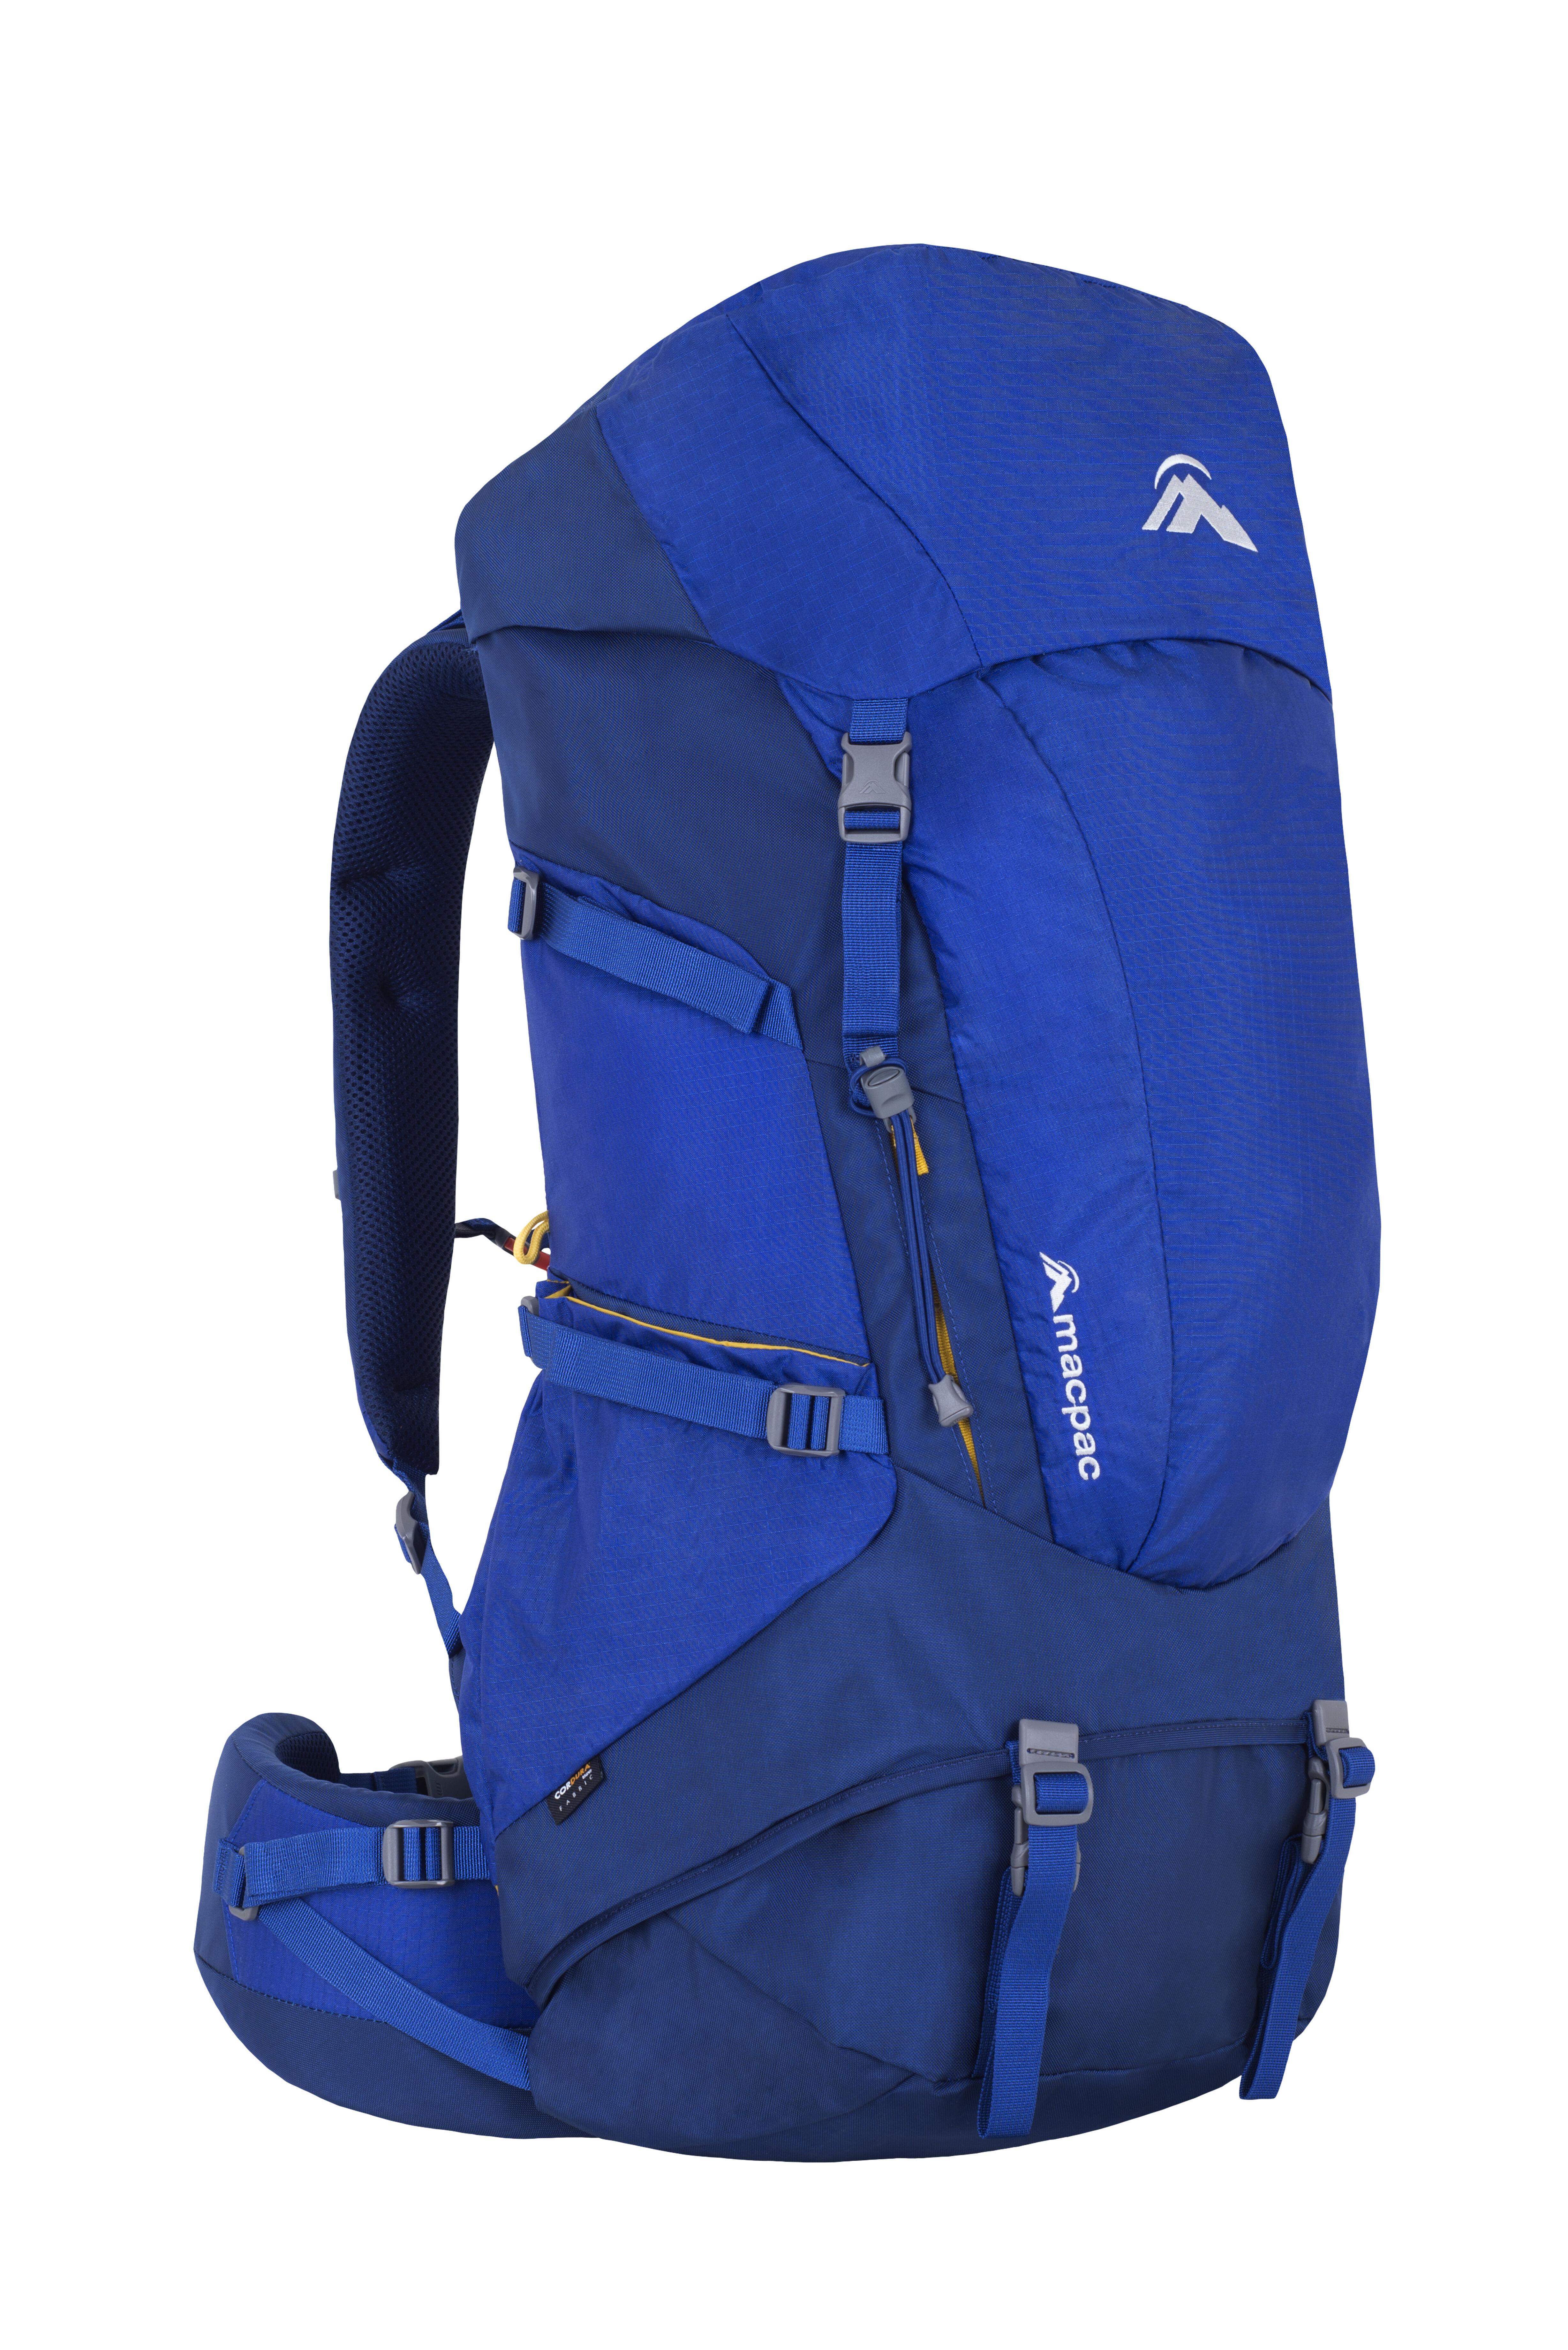 Victoria Blue Macpac Torlesse 50 V2 Rucksack S3